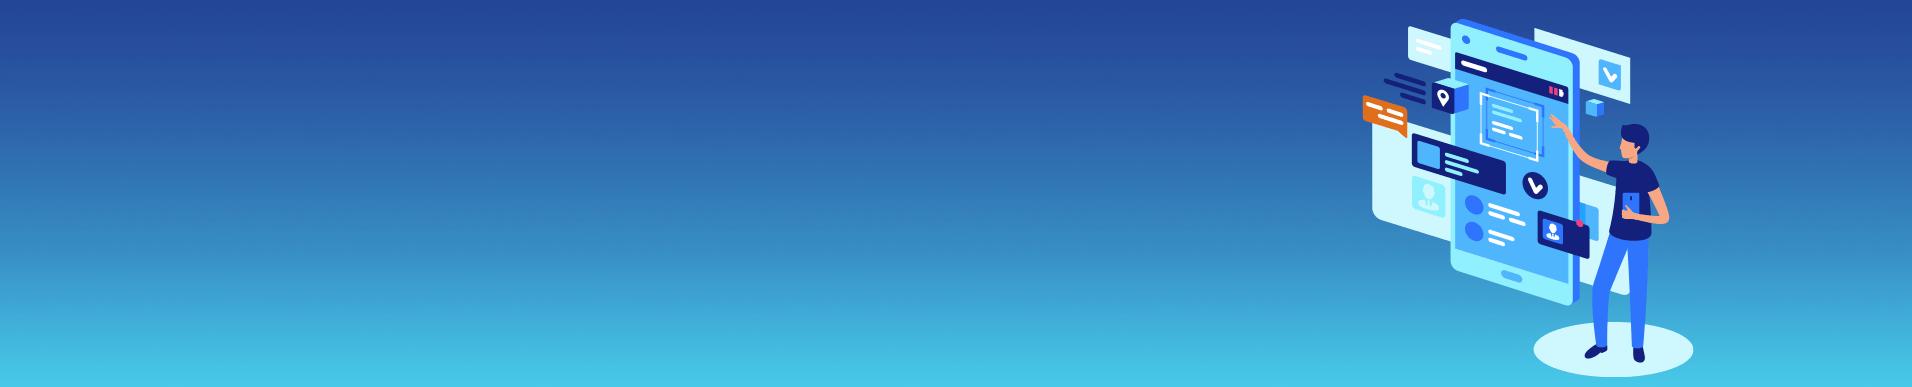 Banner Construtor – Desktop